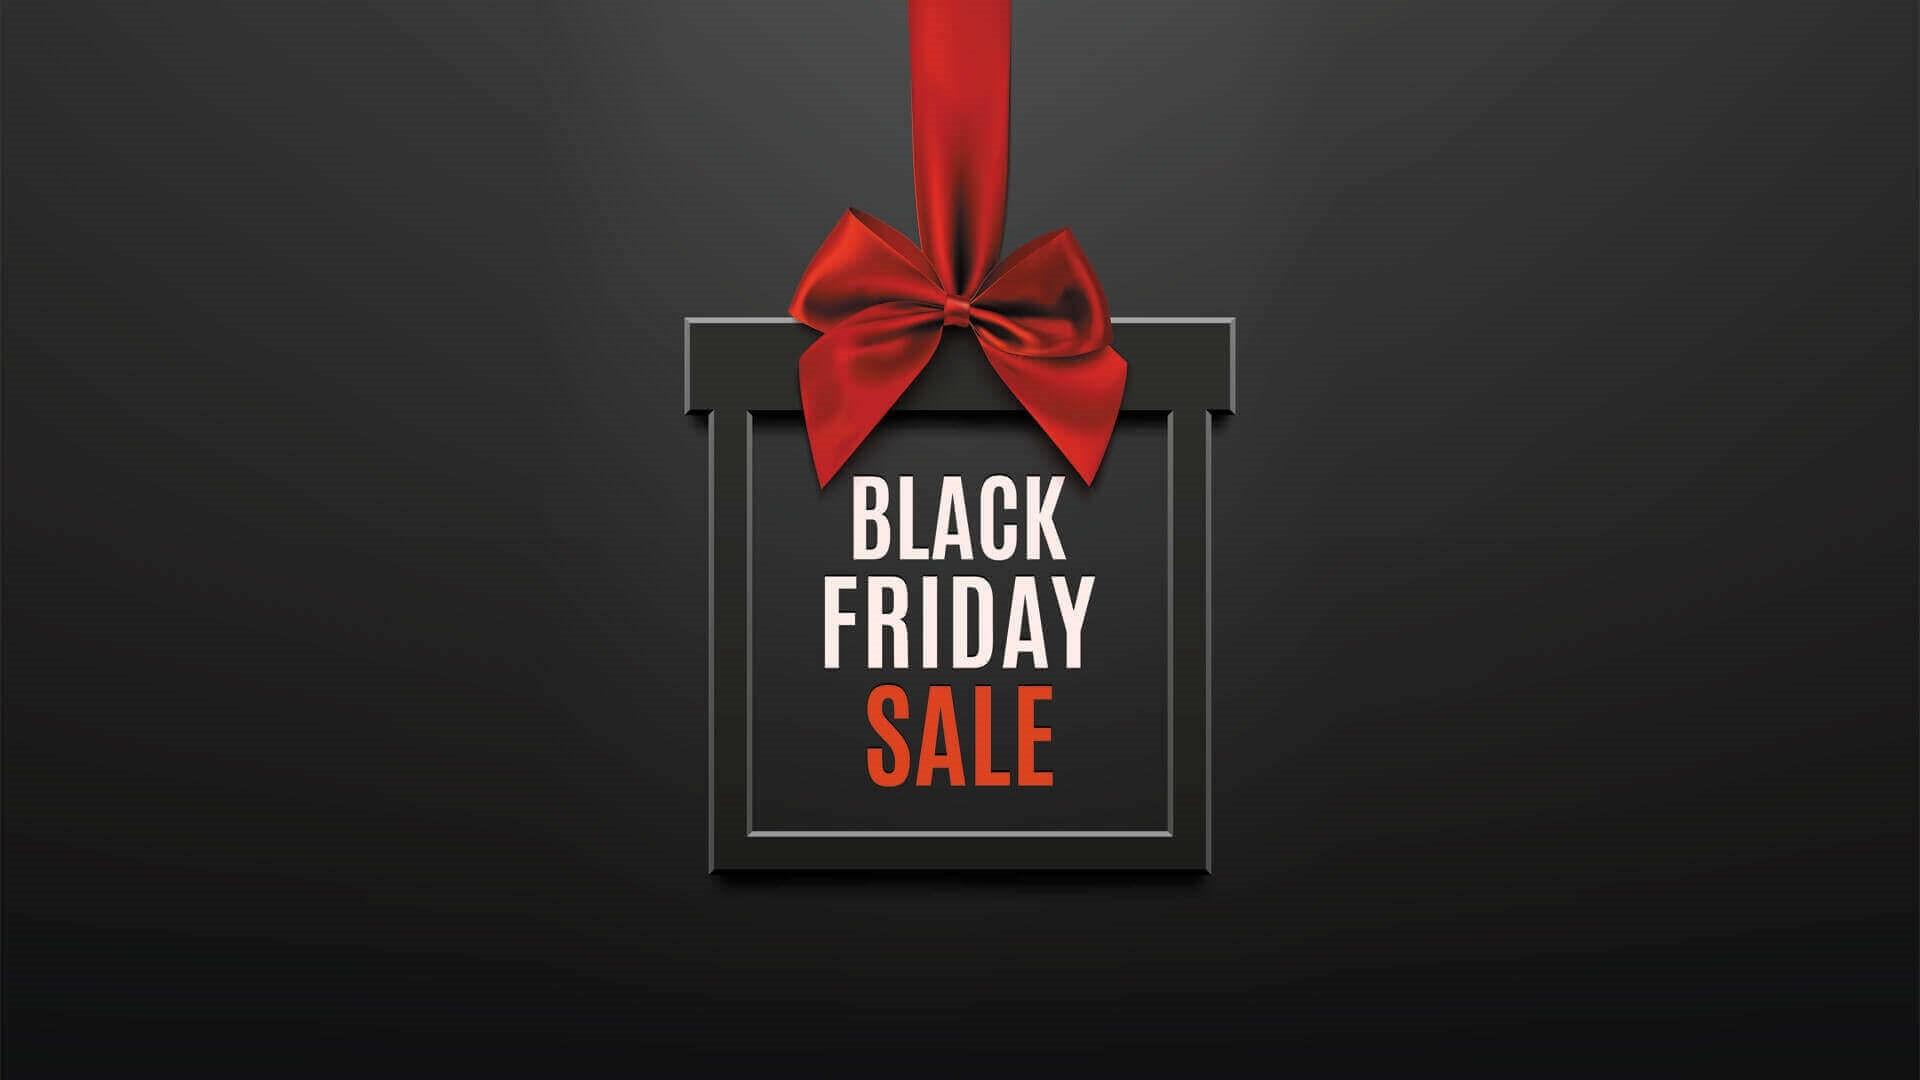 Black Friday hd wallpaper download